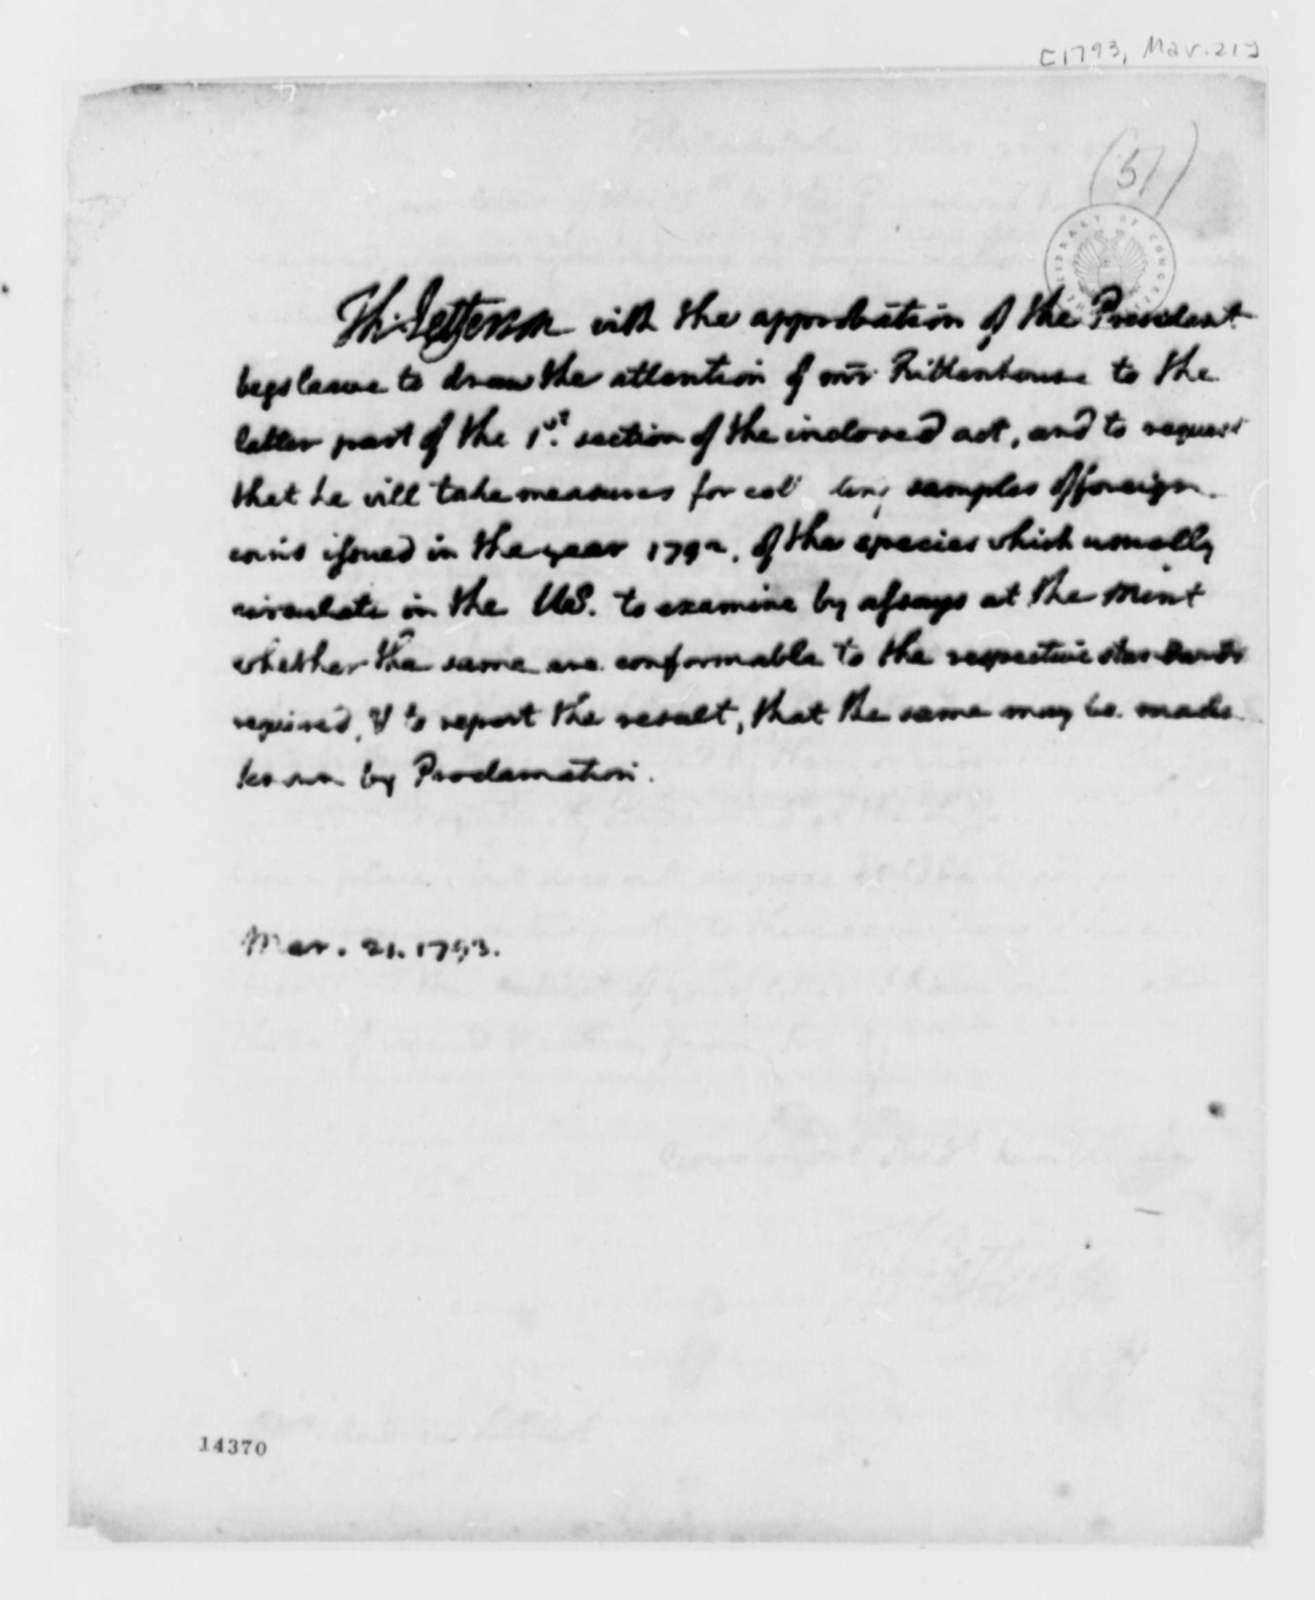 Thomas Jefferson to David Rittenshouse, March 21, 1793